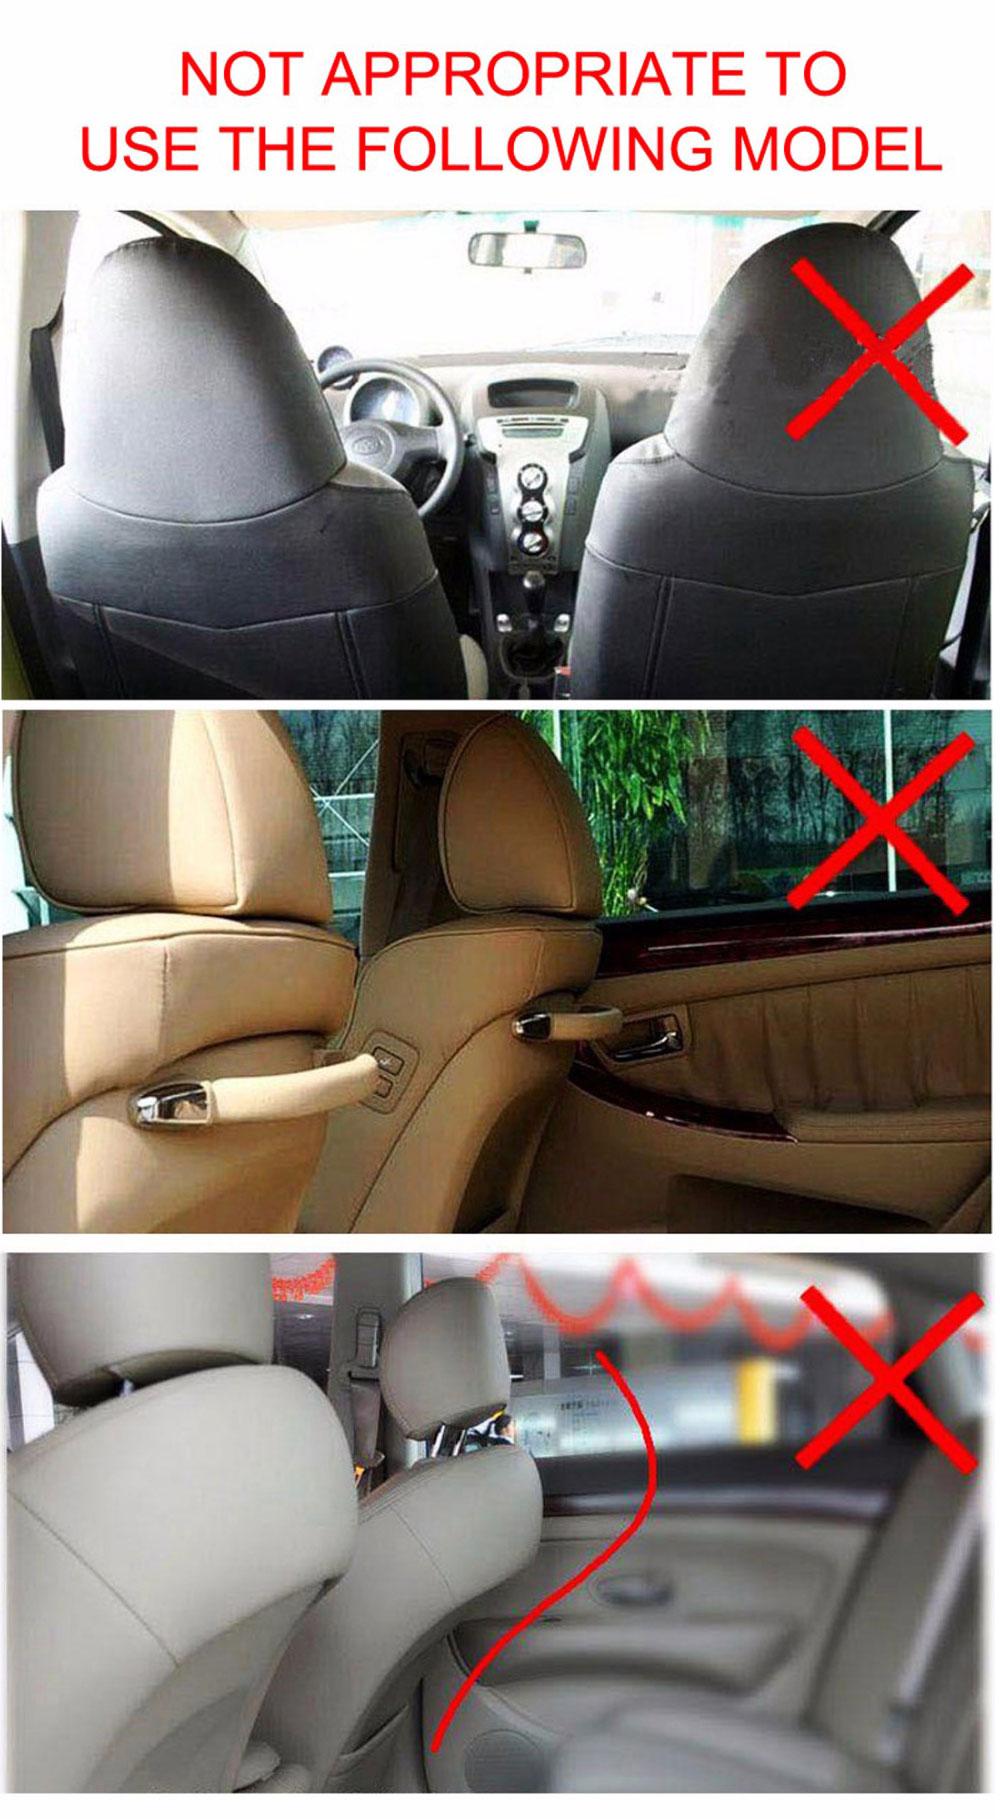 Car Organizer waterproof Car seat covers protector mat Car Storage Bags Seat Back Protector Case Cover Multi-Purpose 7